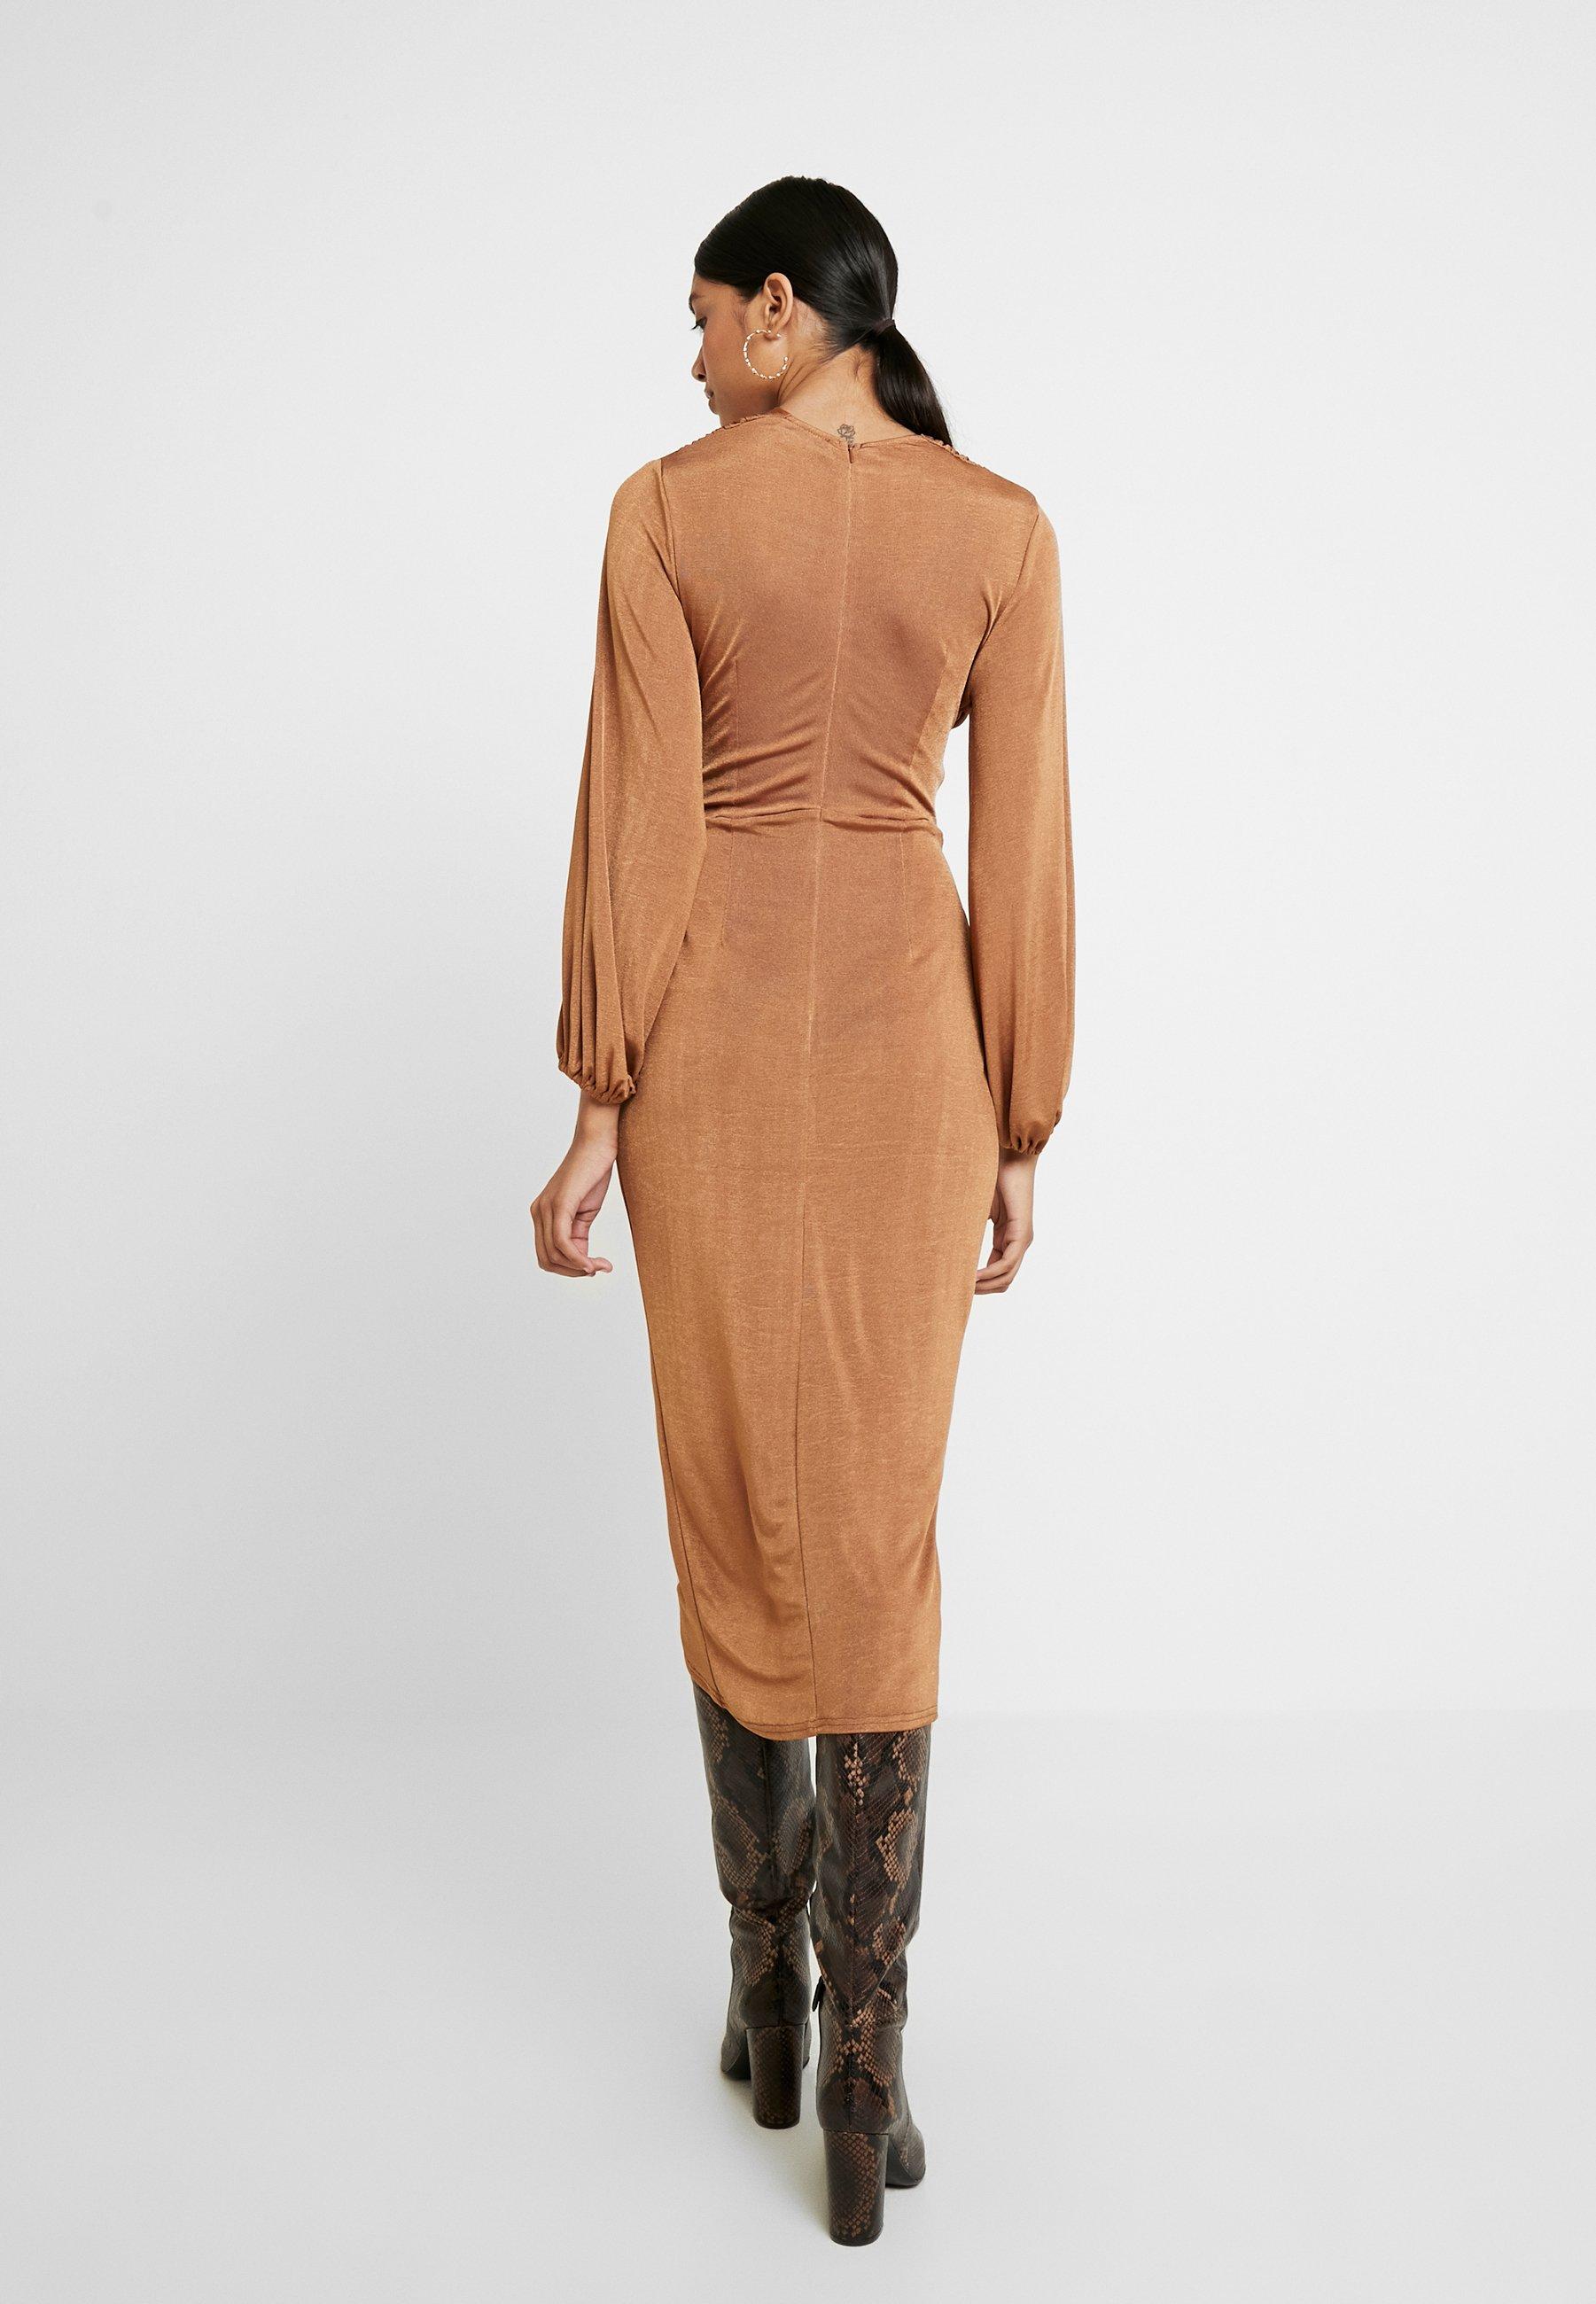 Cool Women's Clothing Closet CLOSET LONDON Cocktail dress / Party dress rust NJxJniJCM